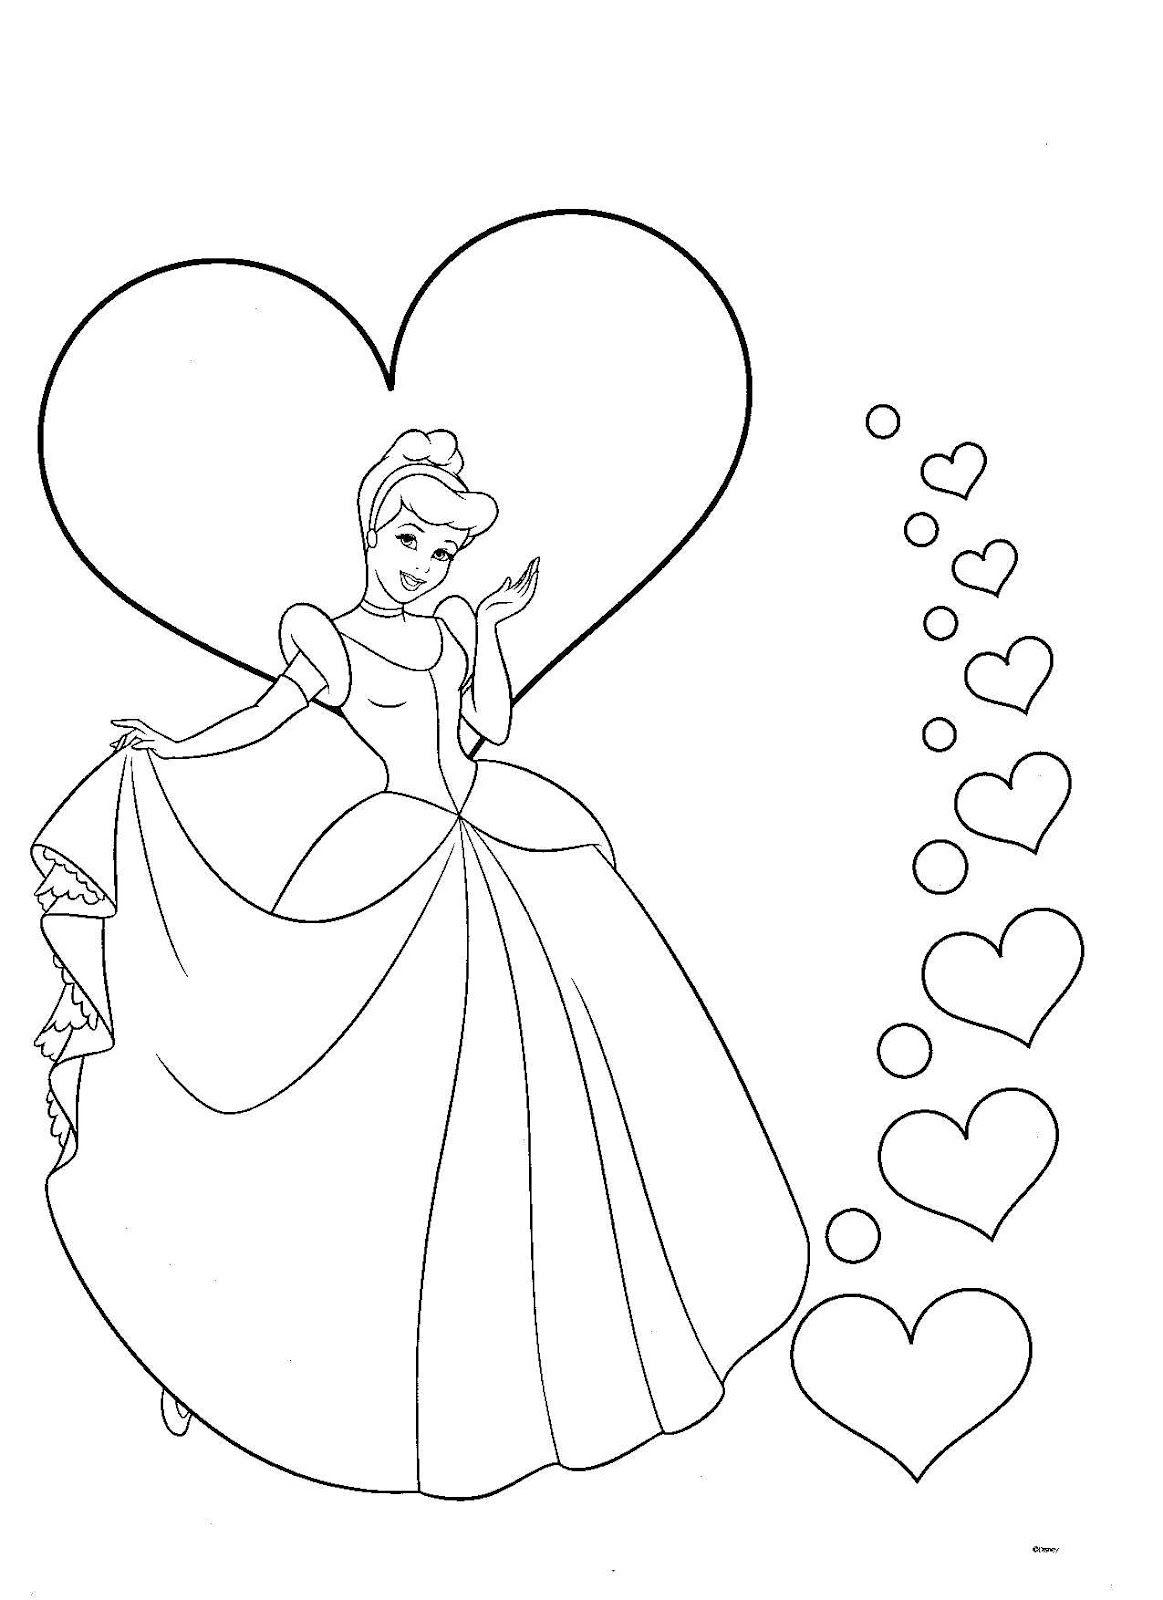 dibujo de princesa para colorear | cenerella | Nero, Bianco e nero